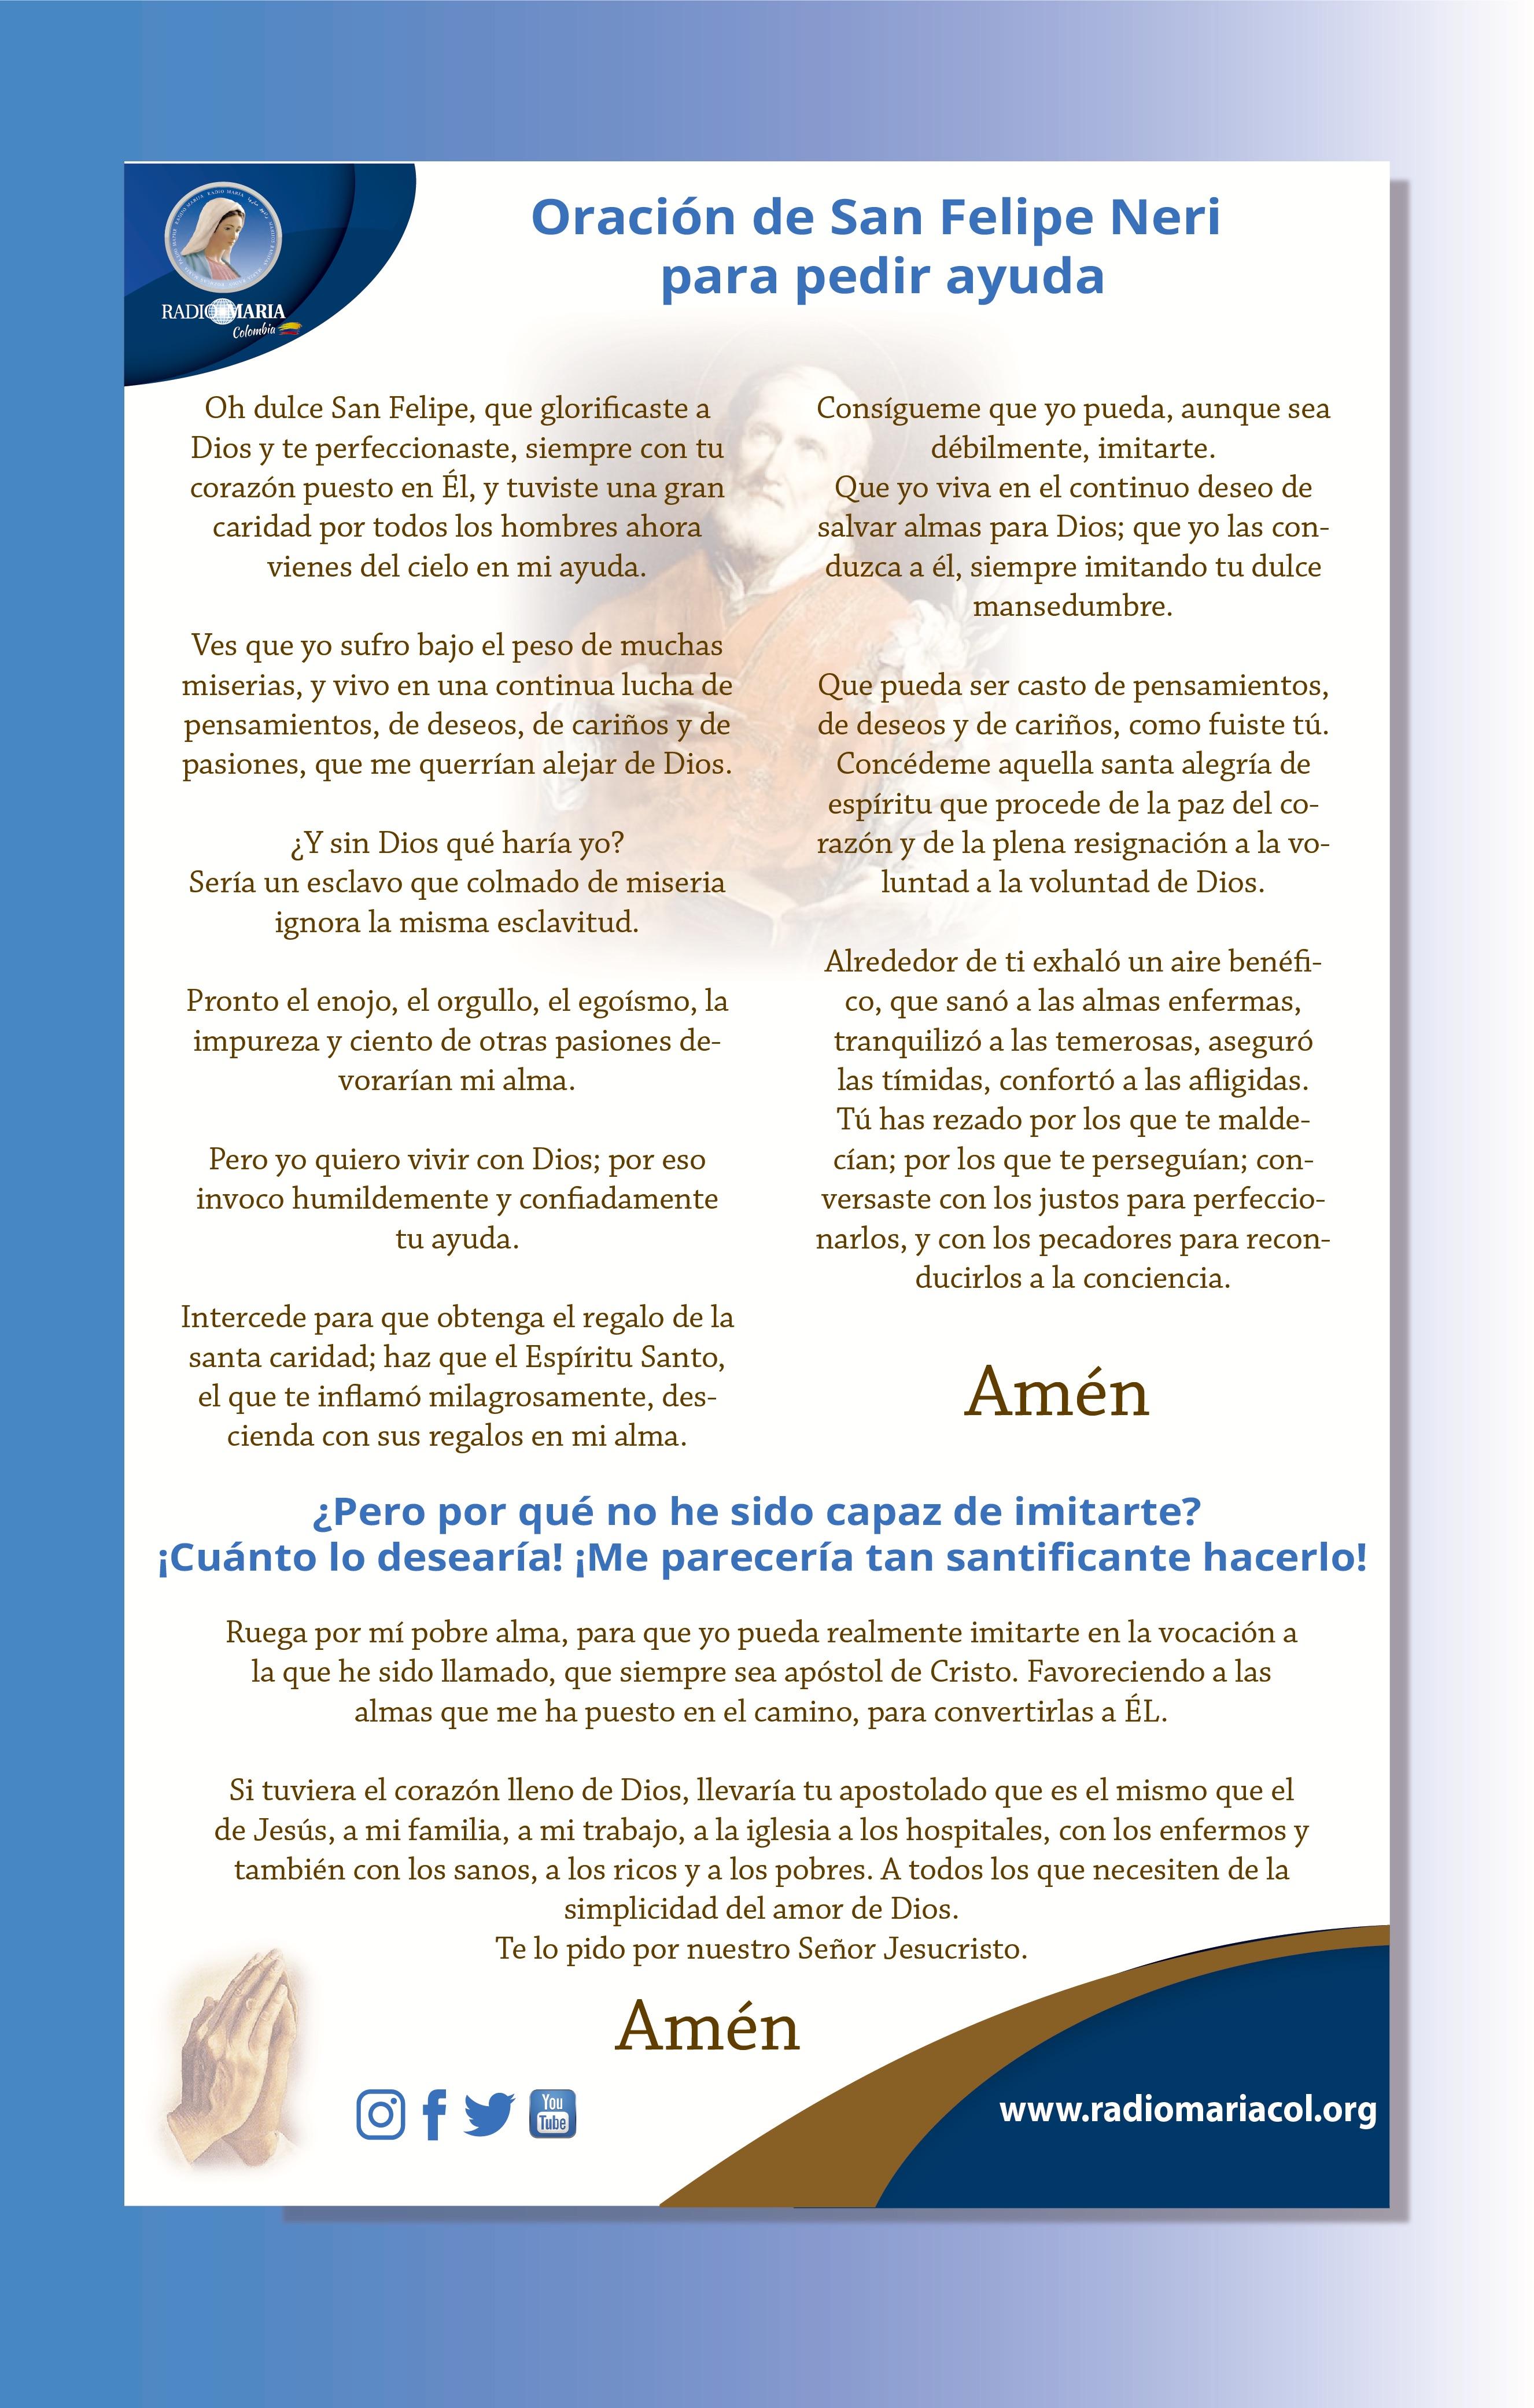 Oración de San Felipe Neri para pedir ayuda